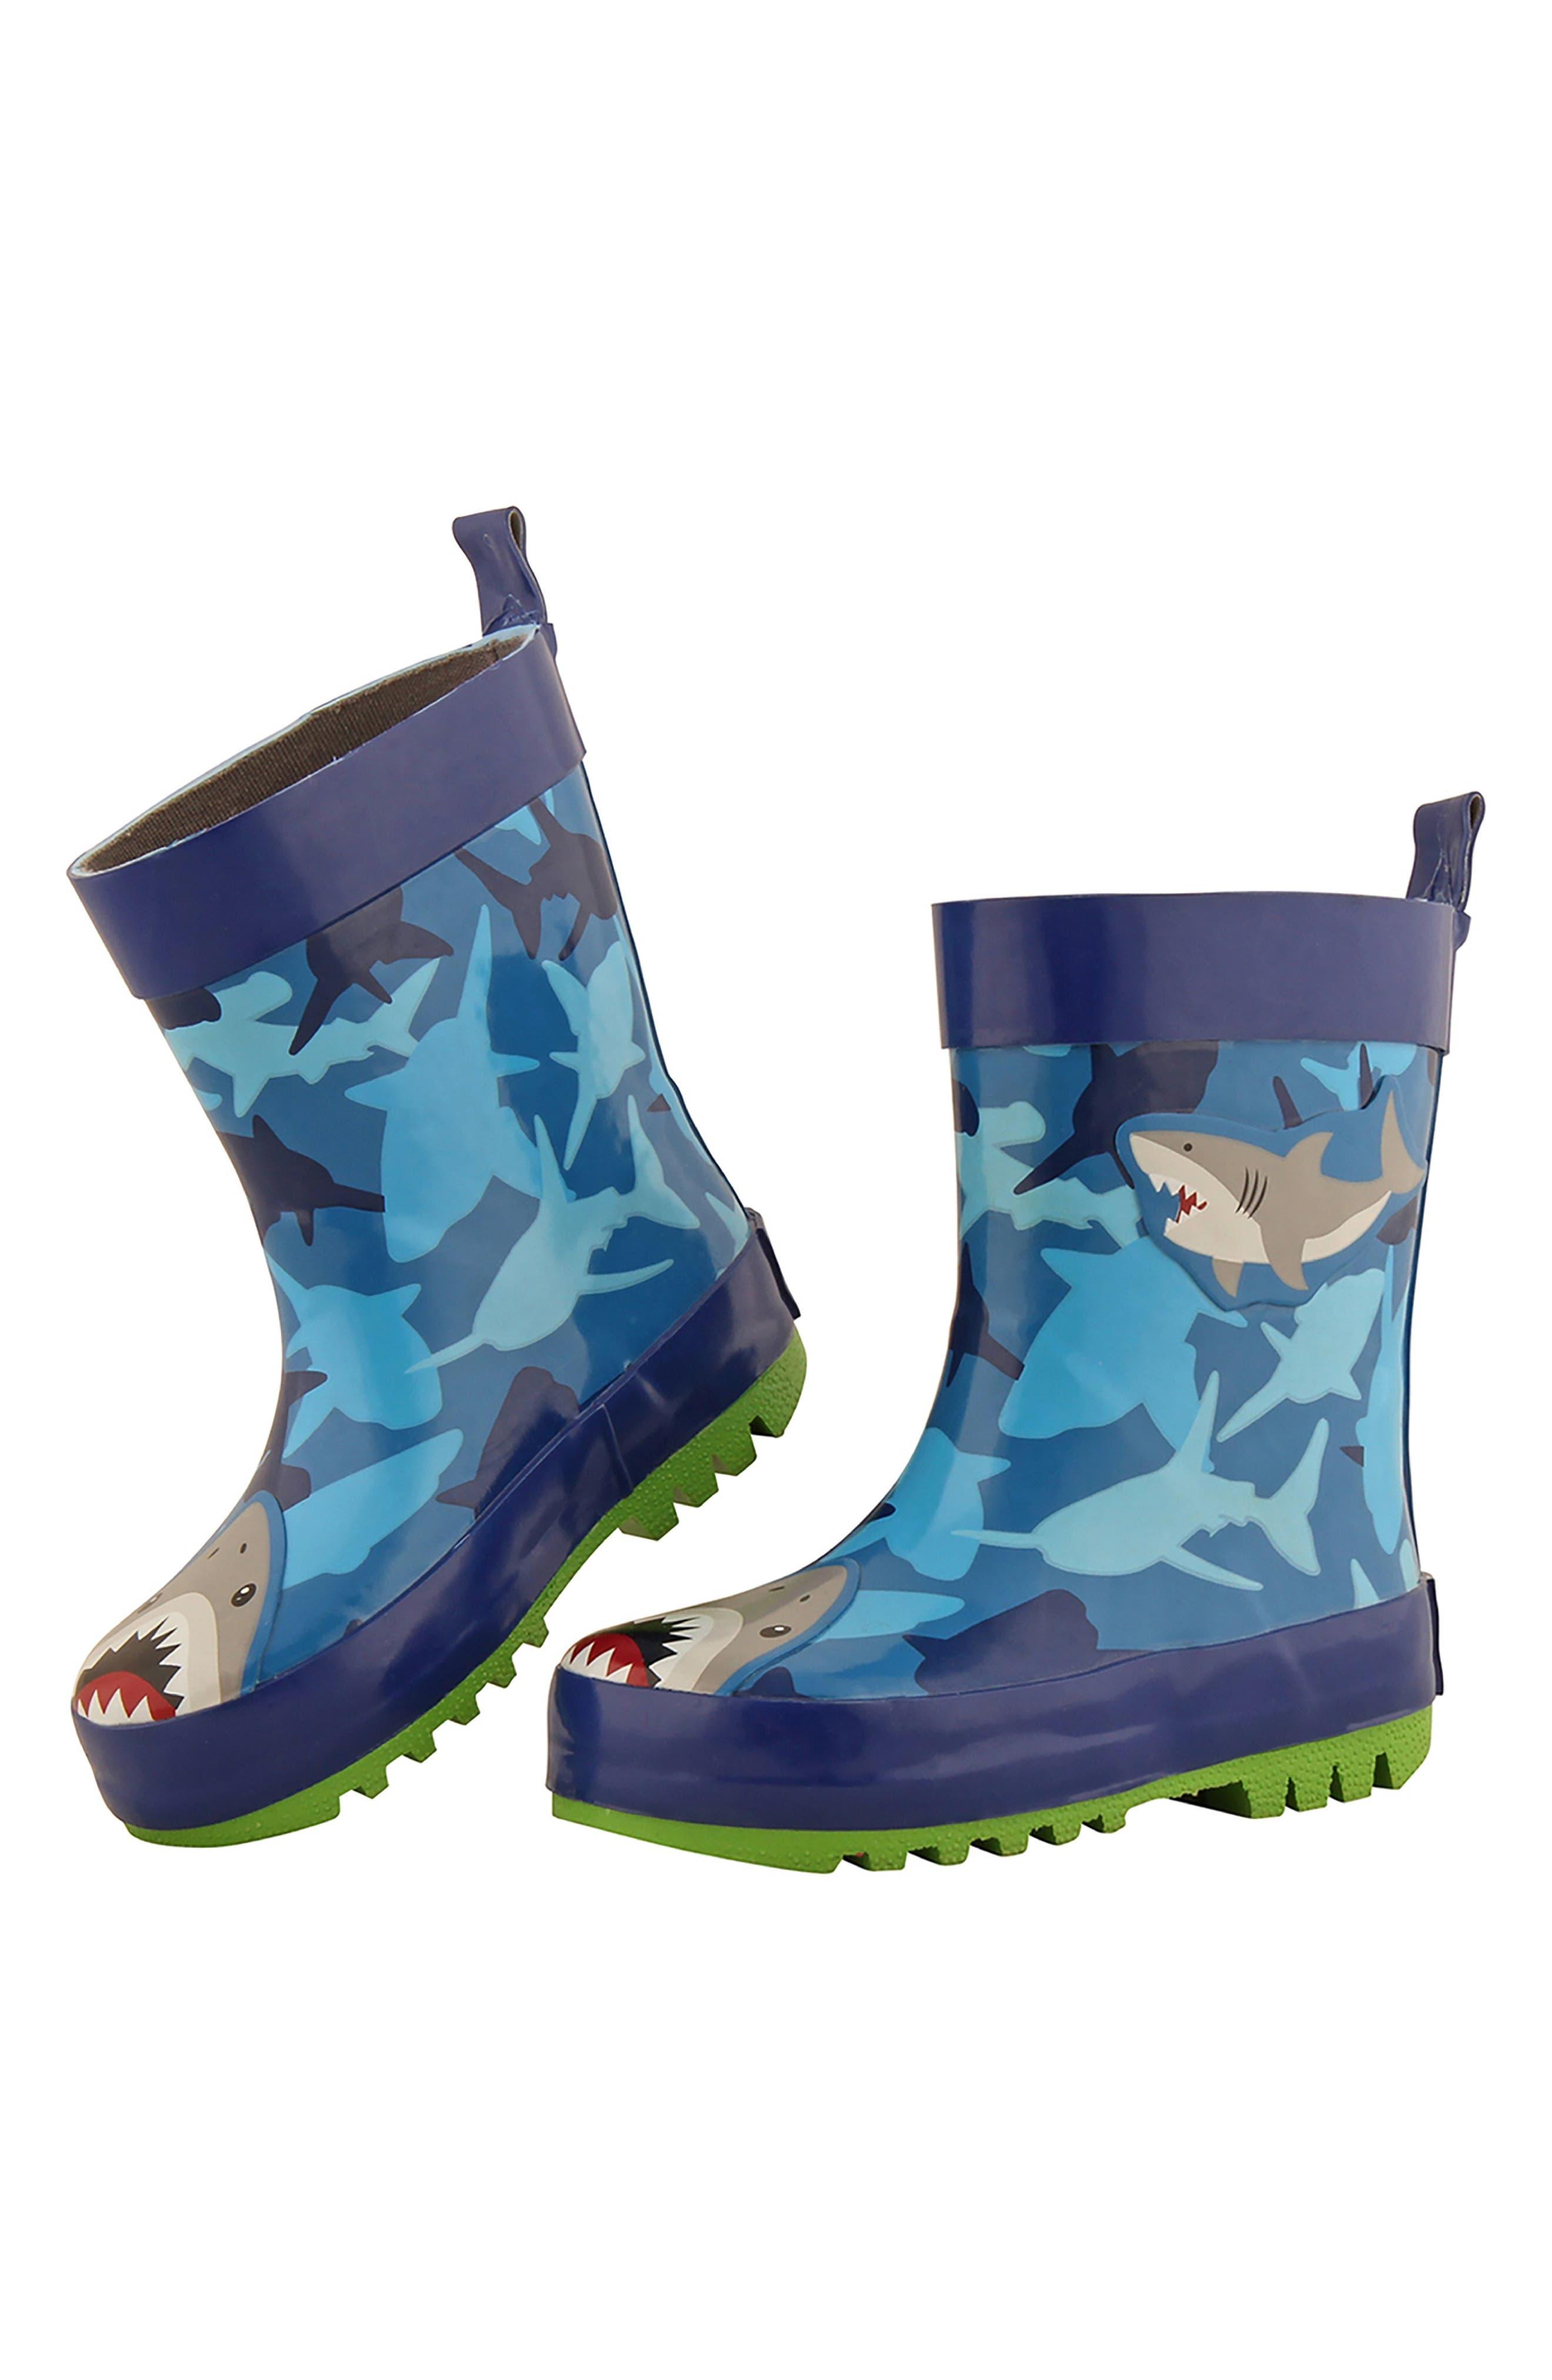 Shark Rain Boots & Umbrella Set,                             Alternate thumbnail 2, color,                             Shark